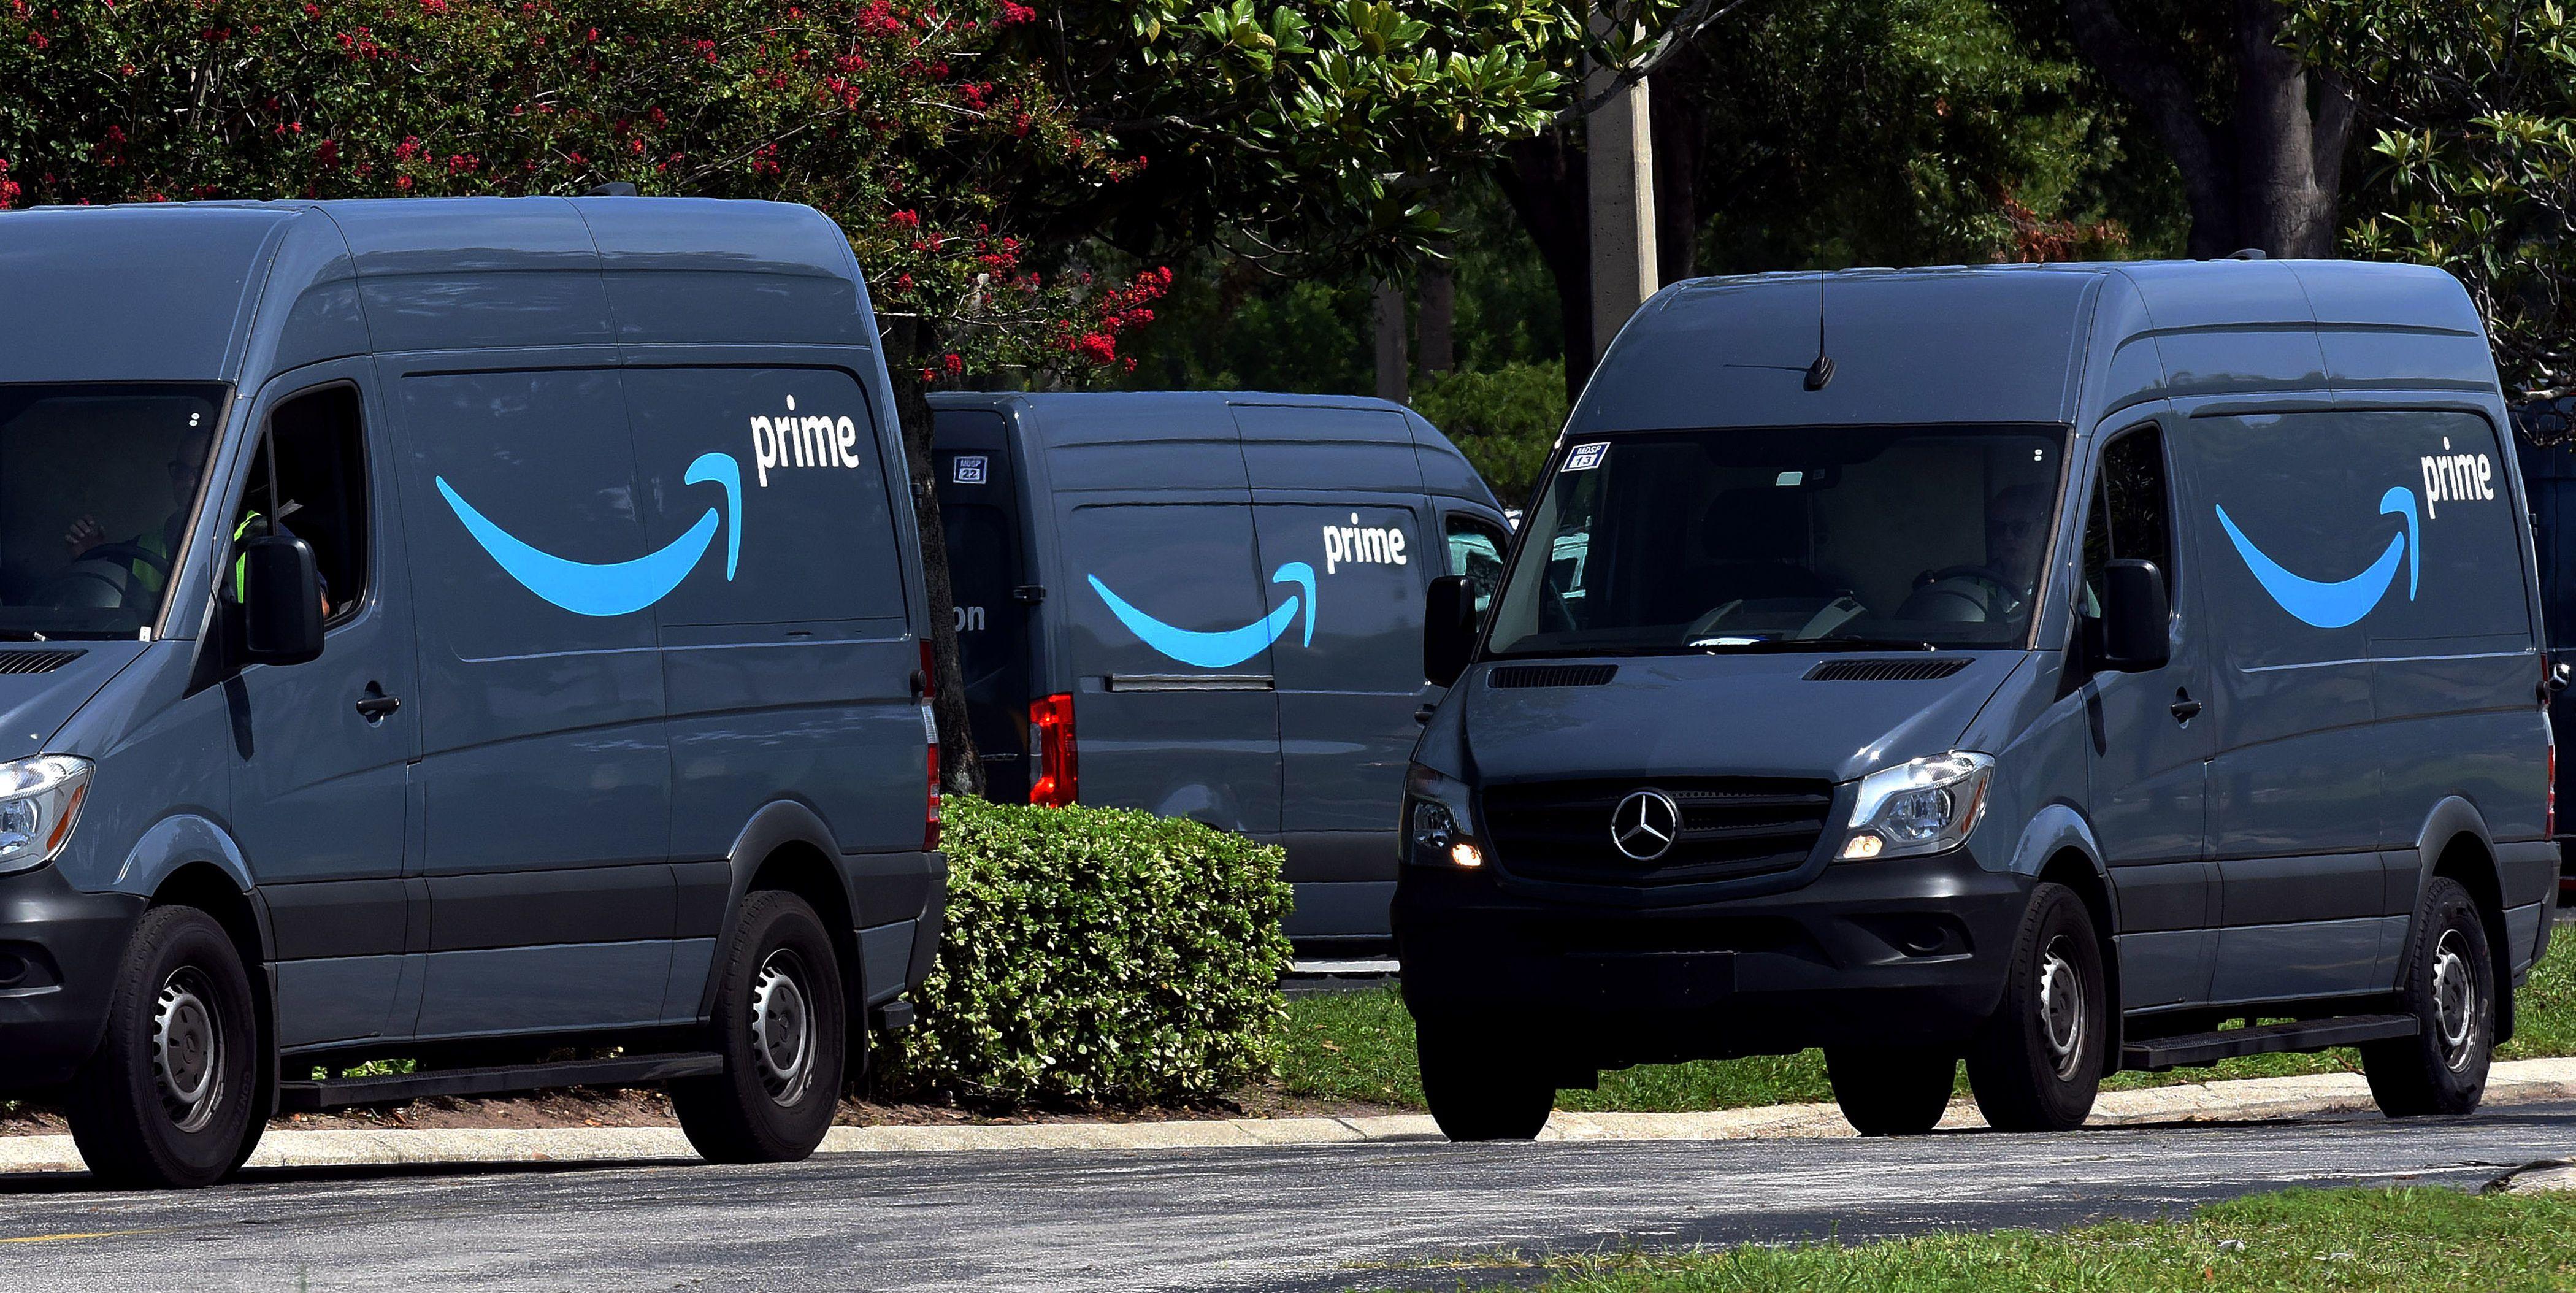 Автомобили курьерской службы Amazon